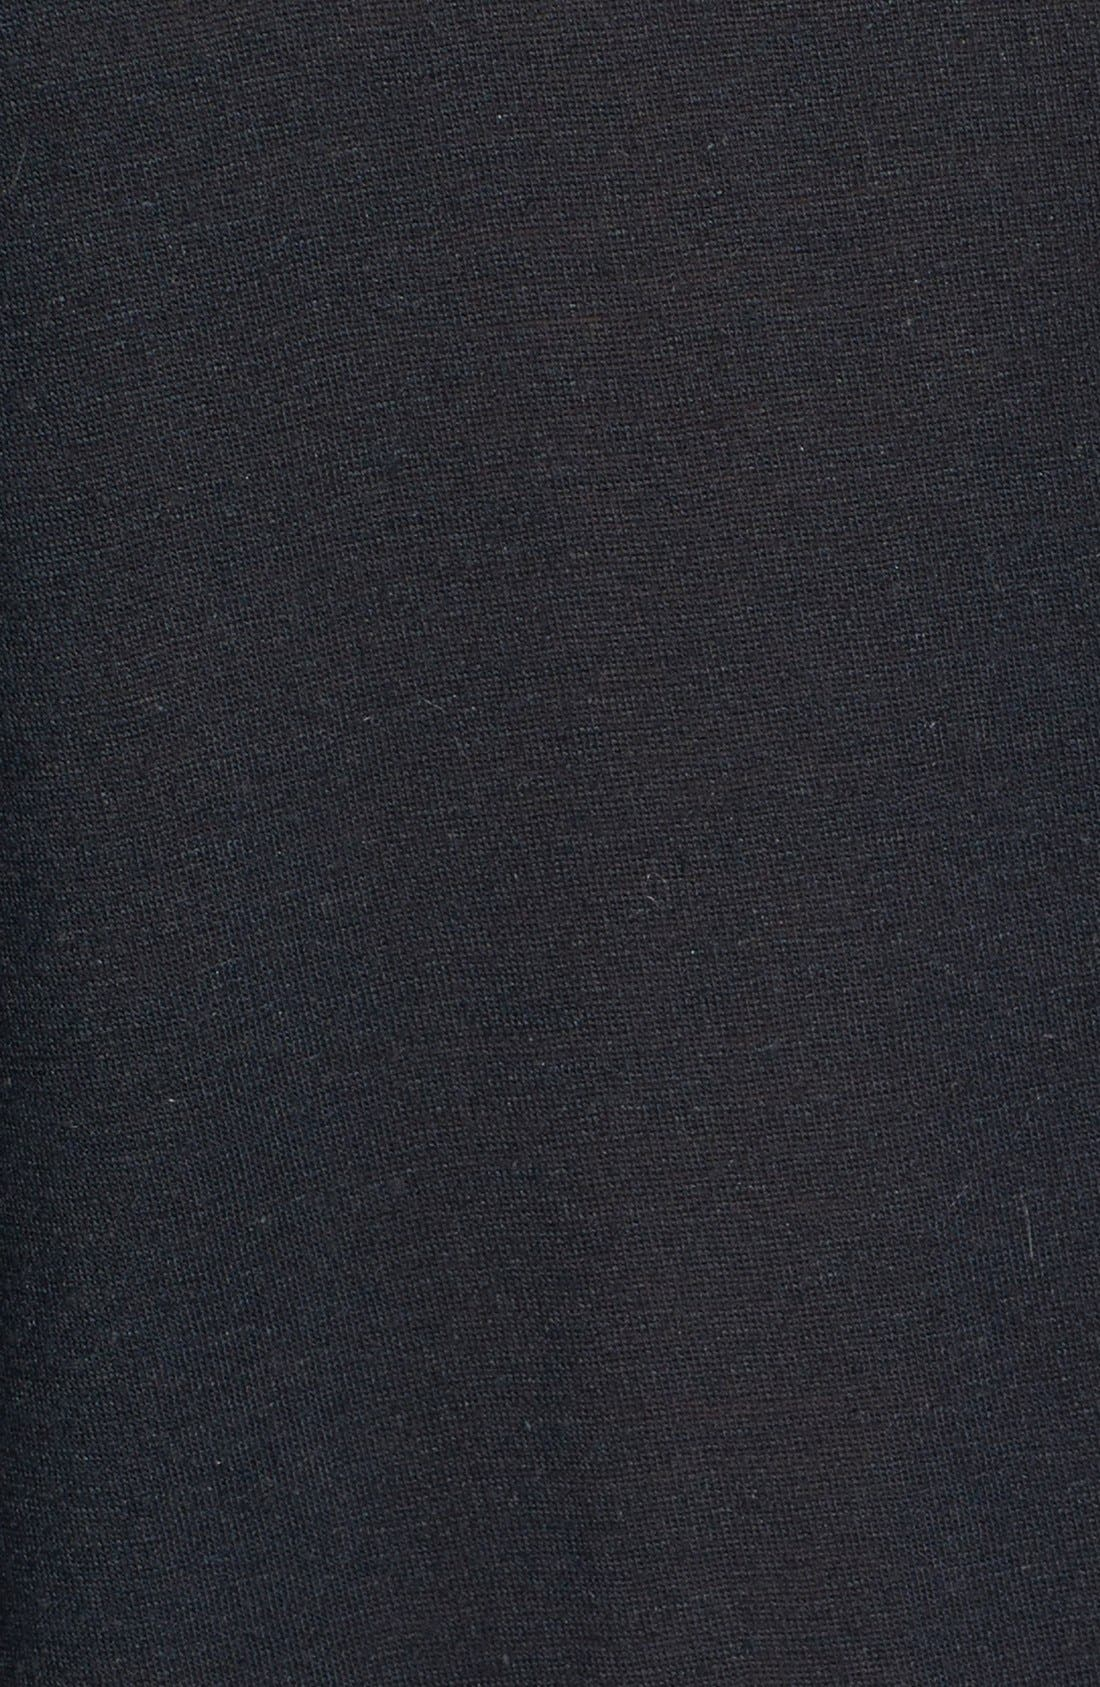 Alternate Image 3  - Topshop Elbow Sleeve Oversized Tee